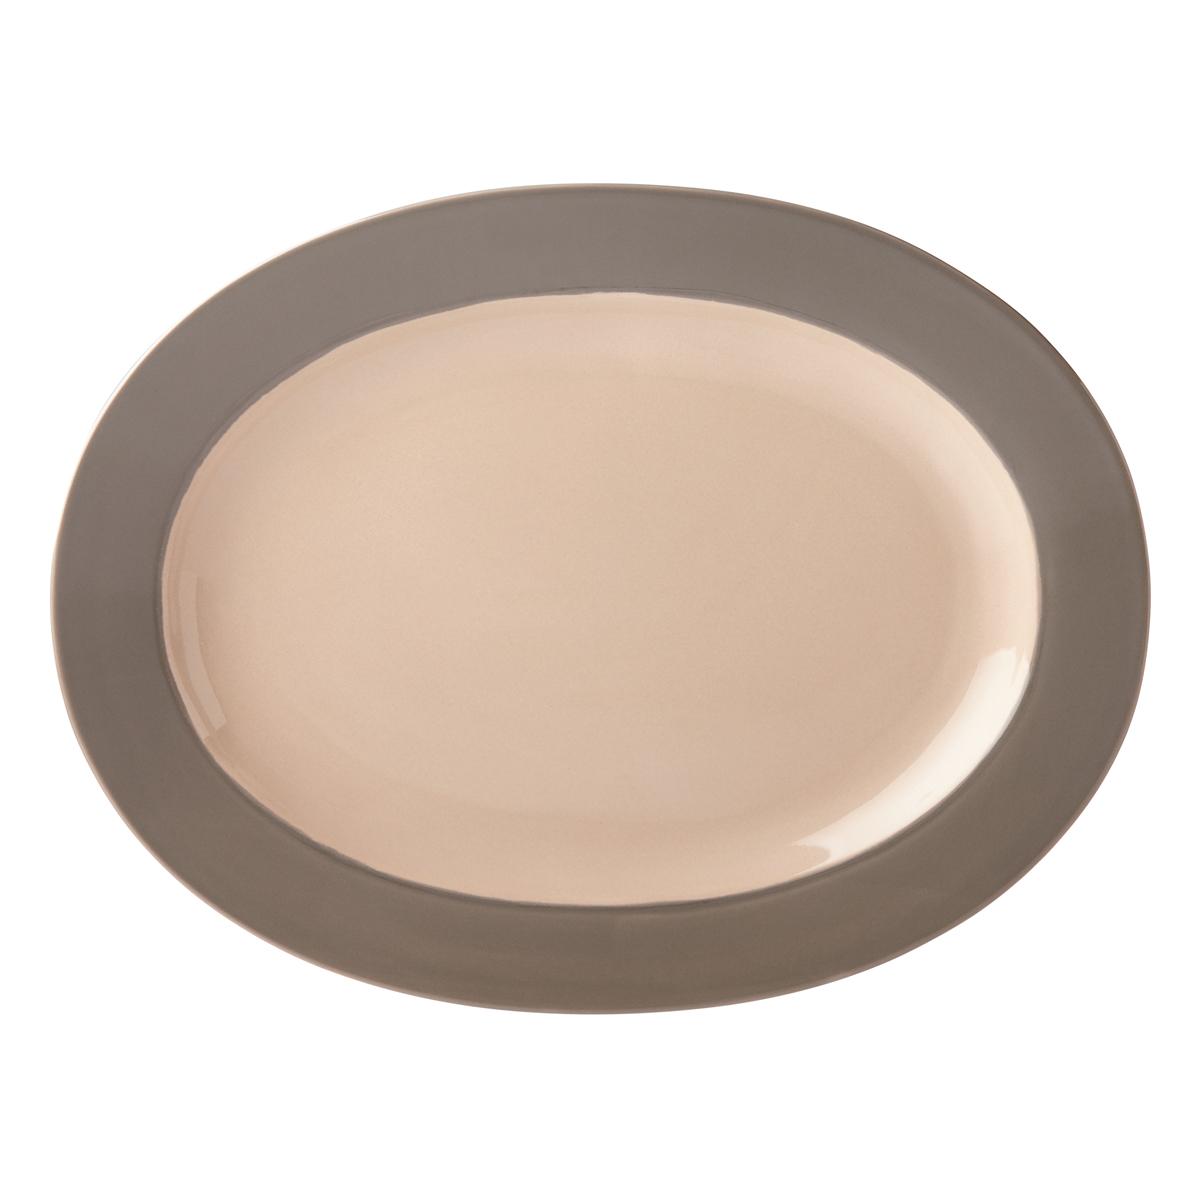 Kate Spade China by Lenox, Stoneware Nolita Gray Platter